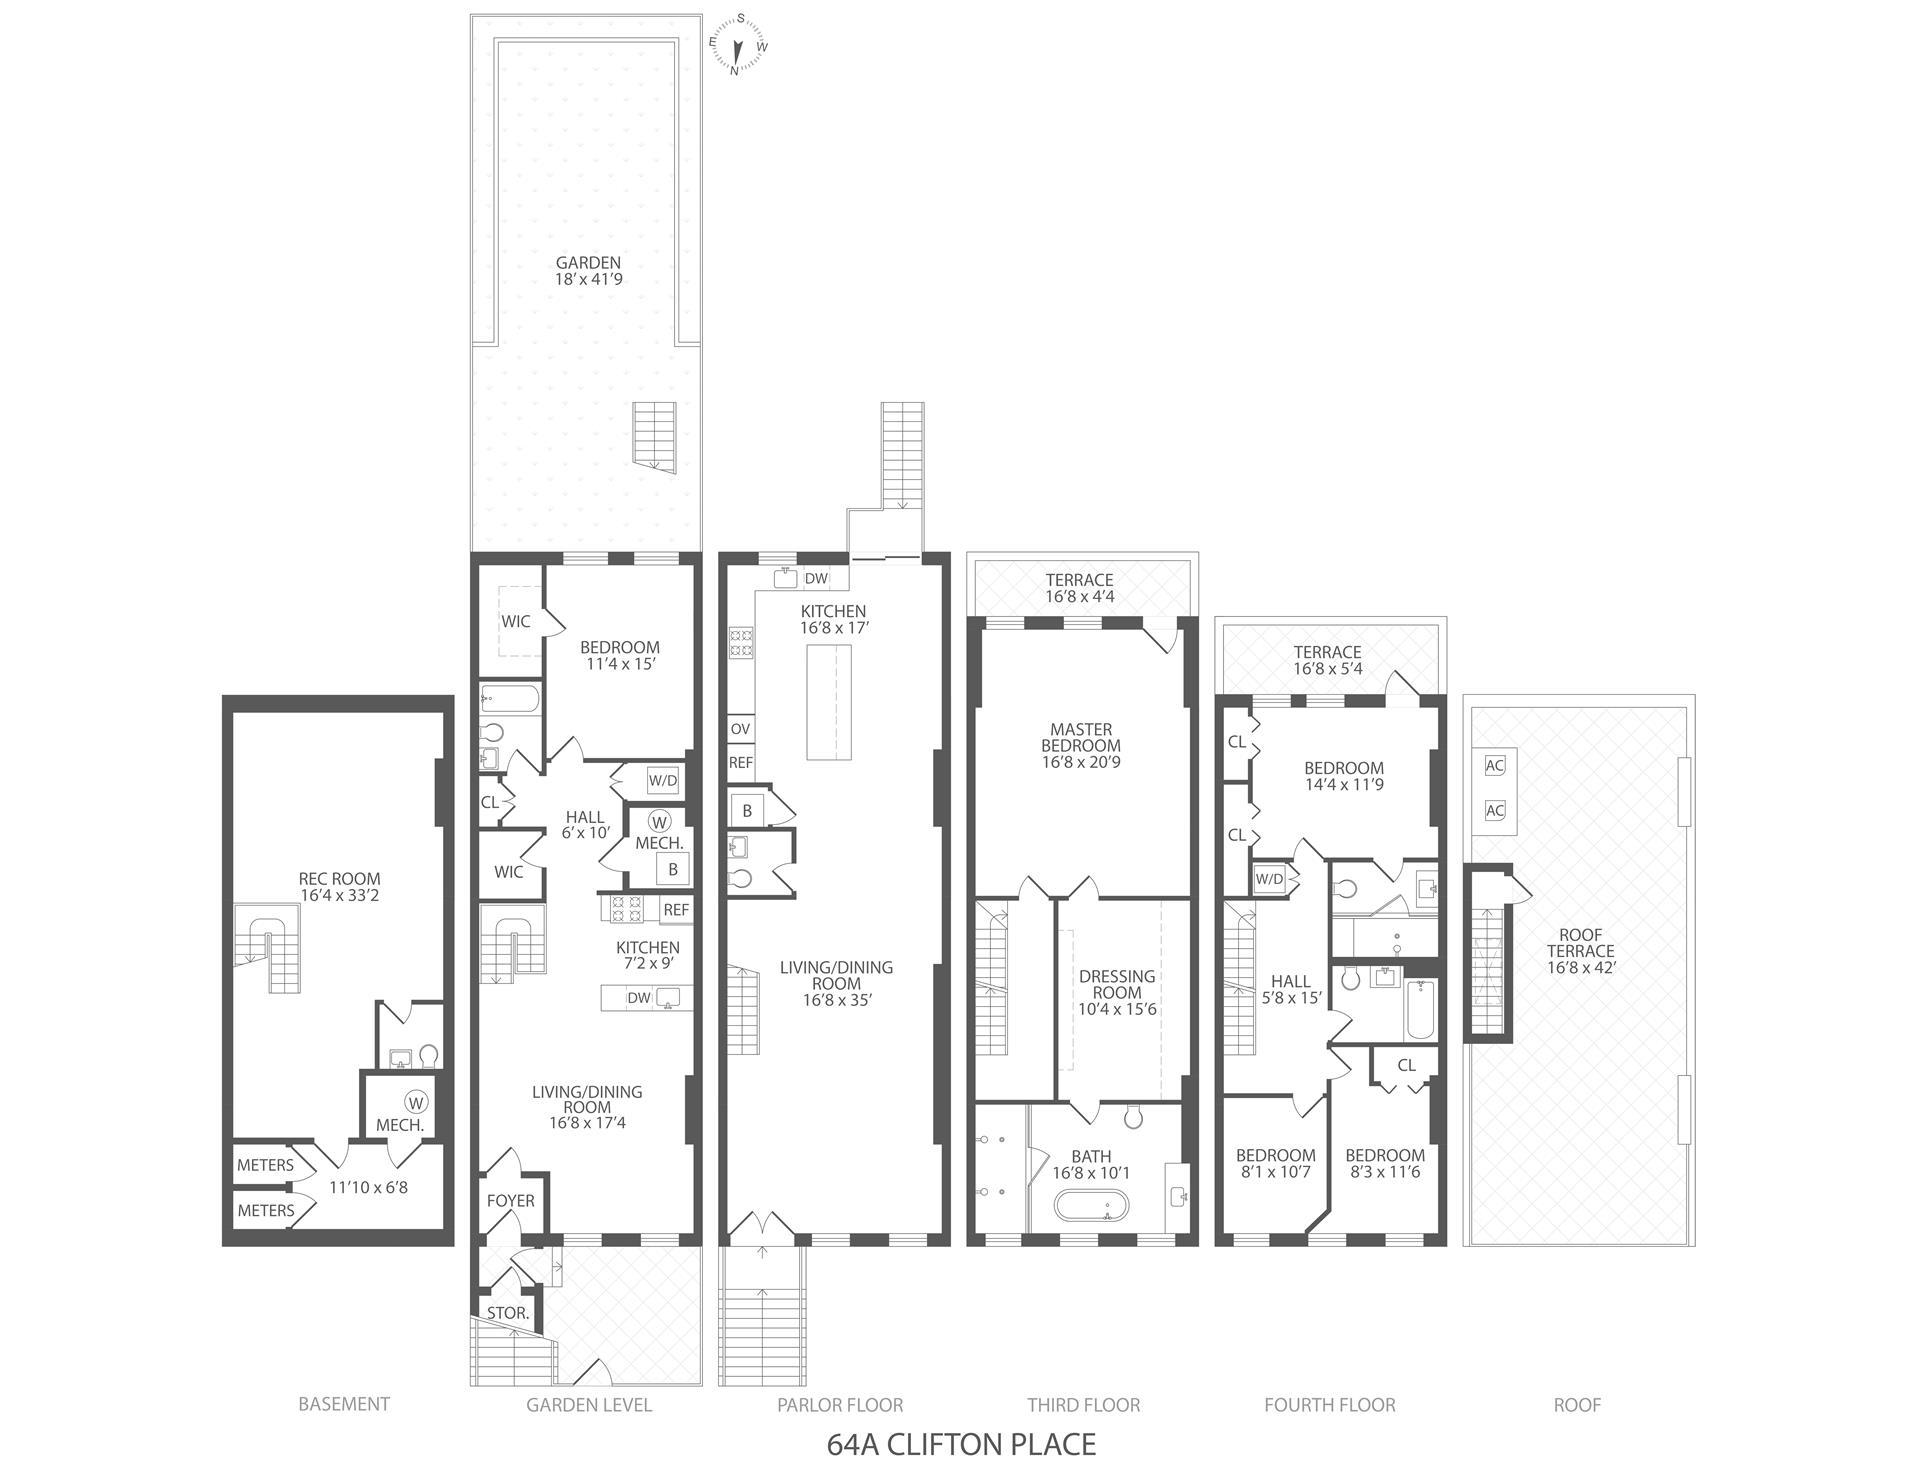 Floor plan of 64A Clifton Pl - Clinton Hill, New York